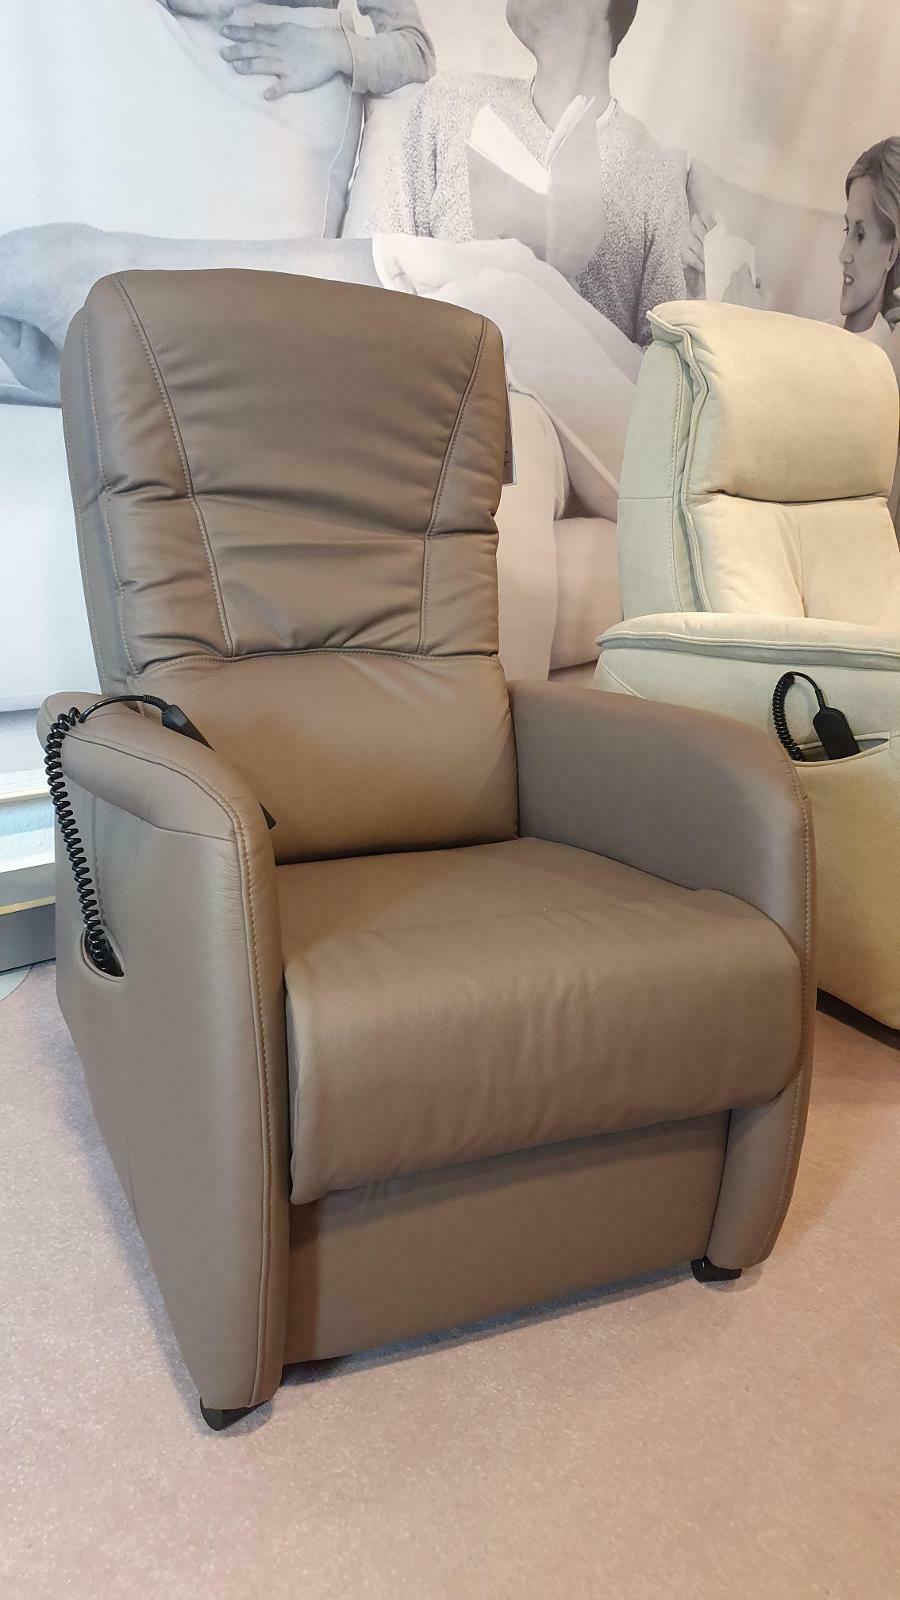 AP02 - TV Relaxsessel motorisch in Leder